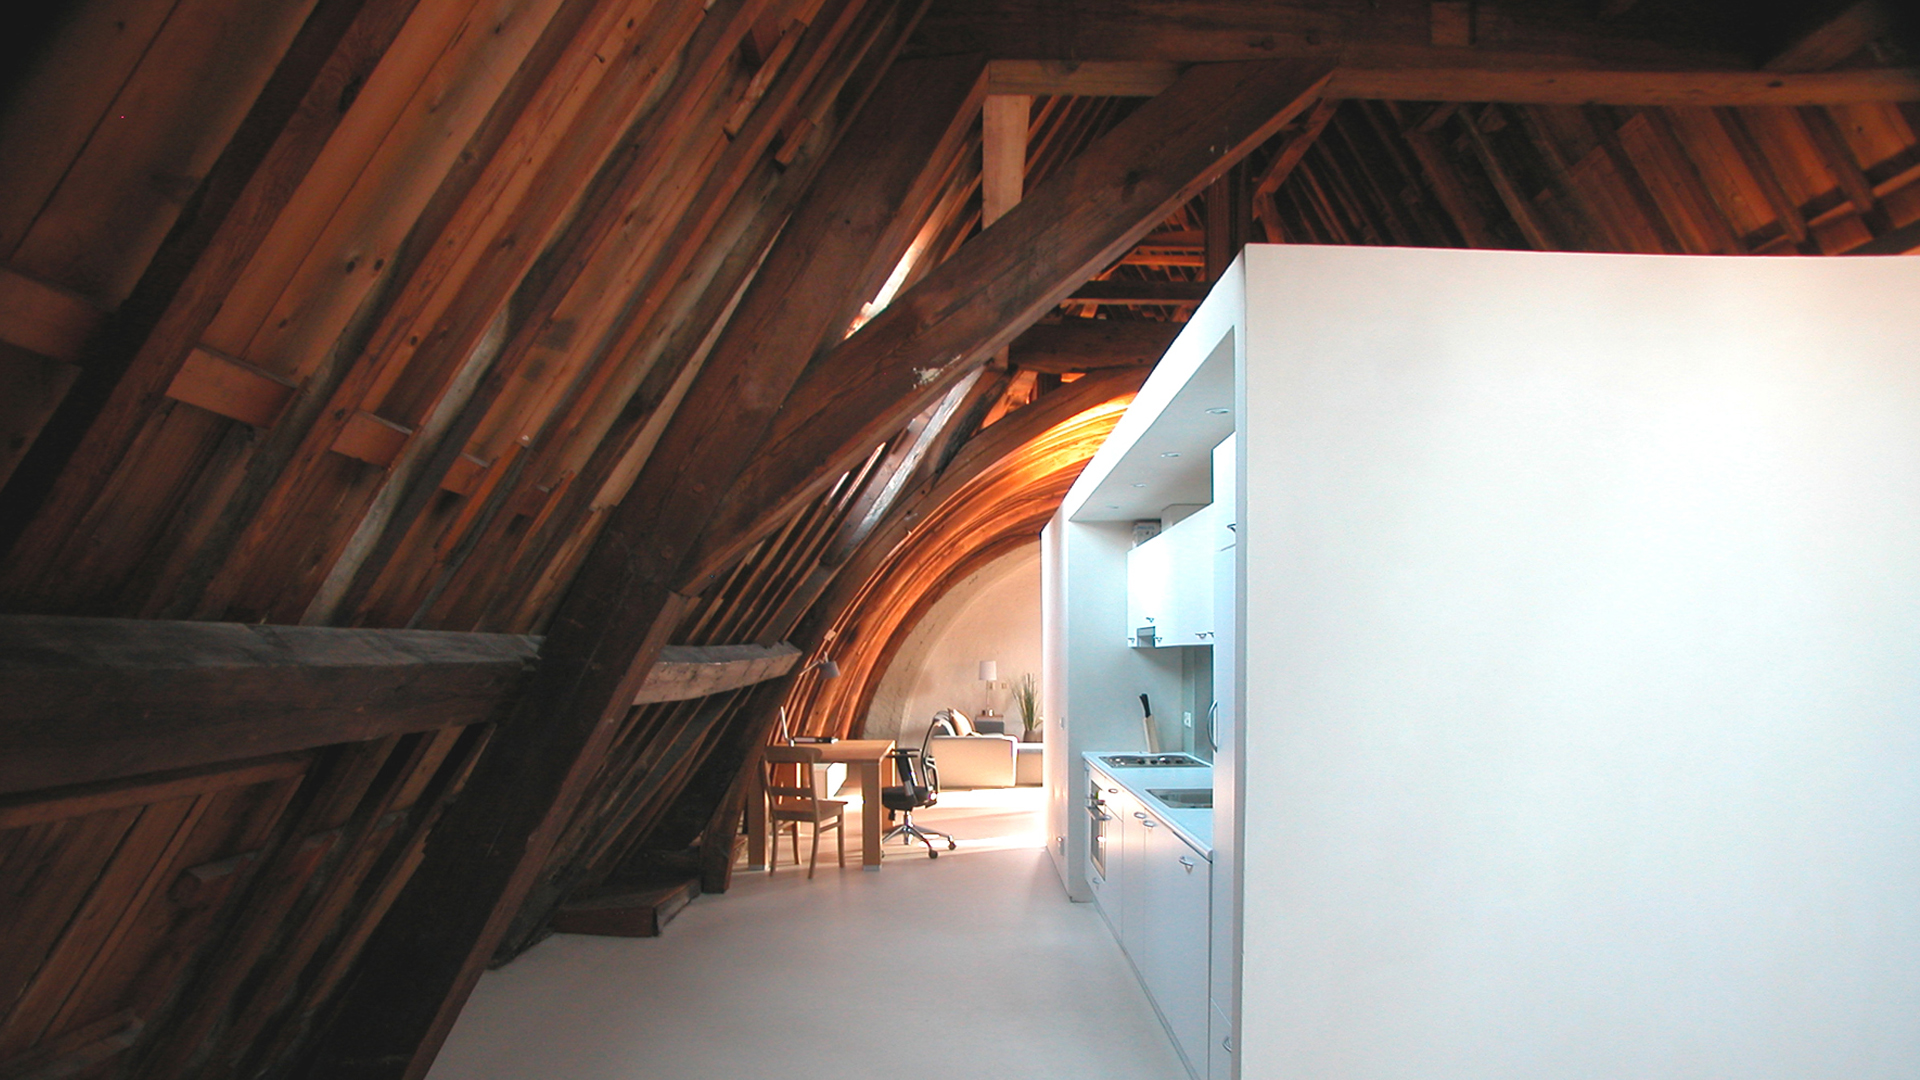 Christoffel 01 loft